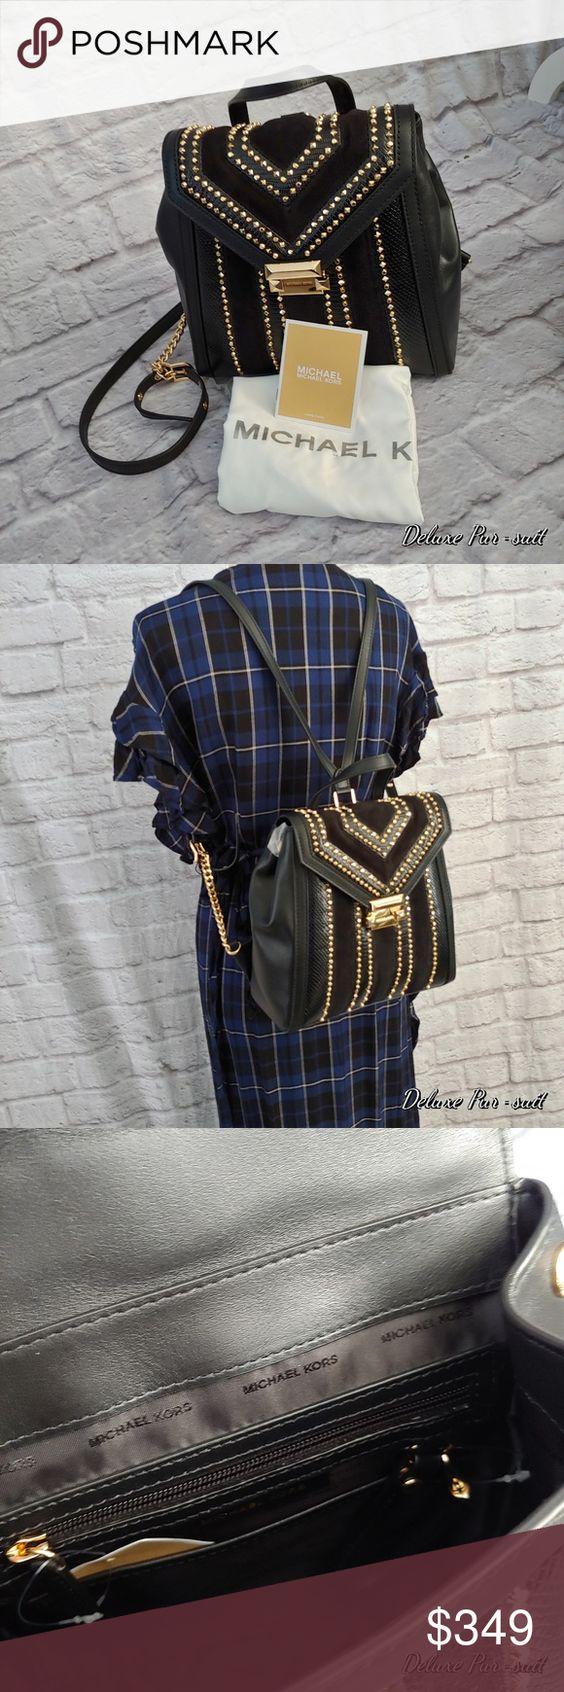 Sold Michael Kors Whitney Mixed Media Backpack New Medium Backpack Beautiful Leather Kor